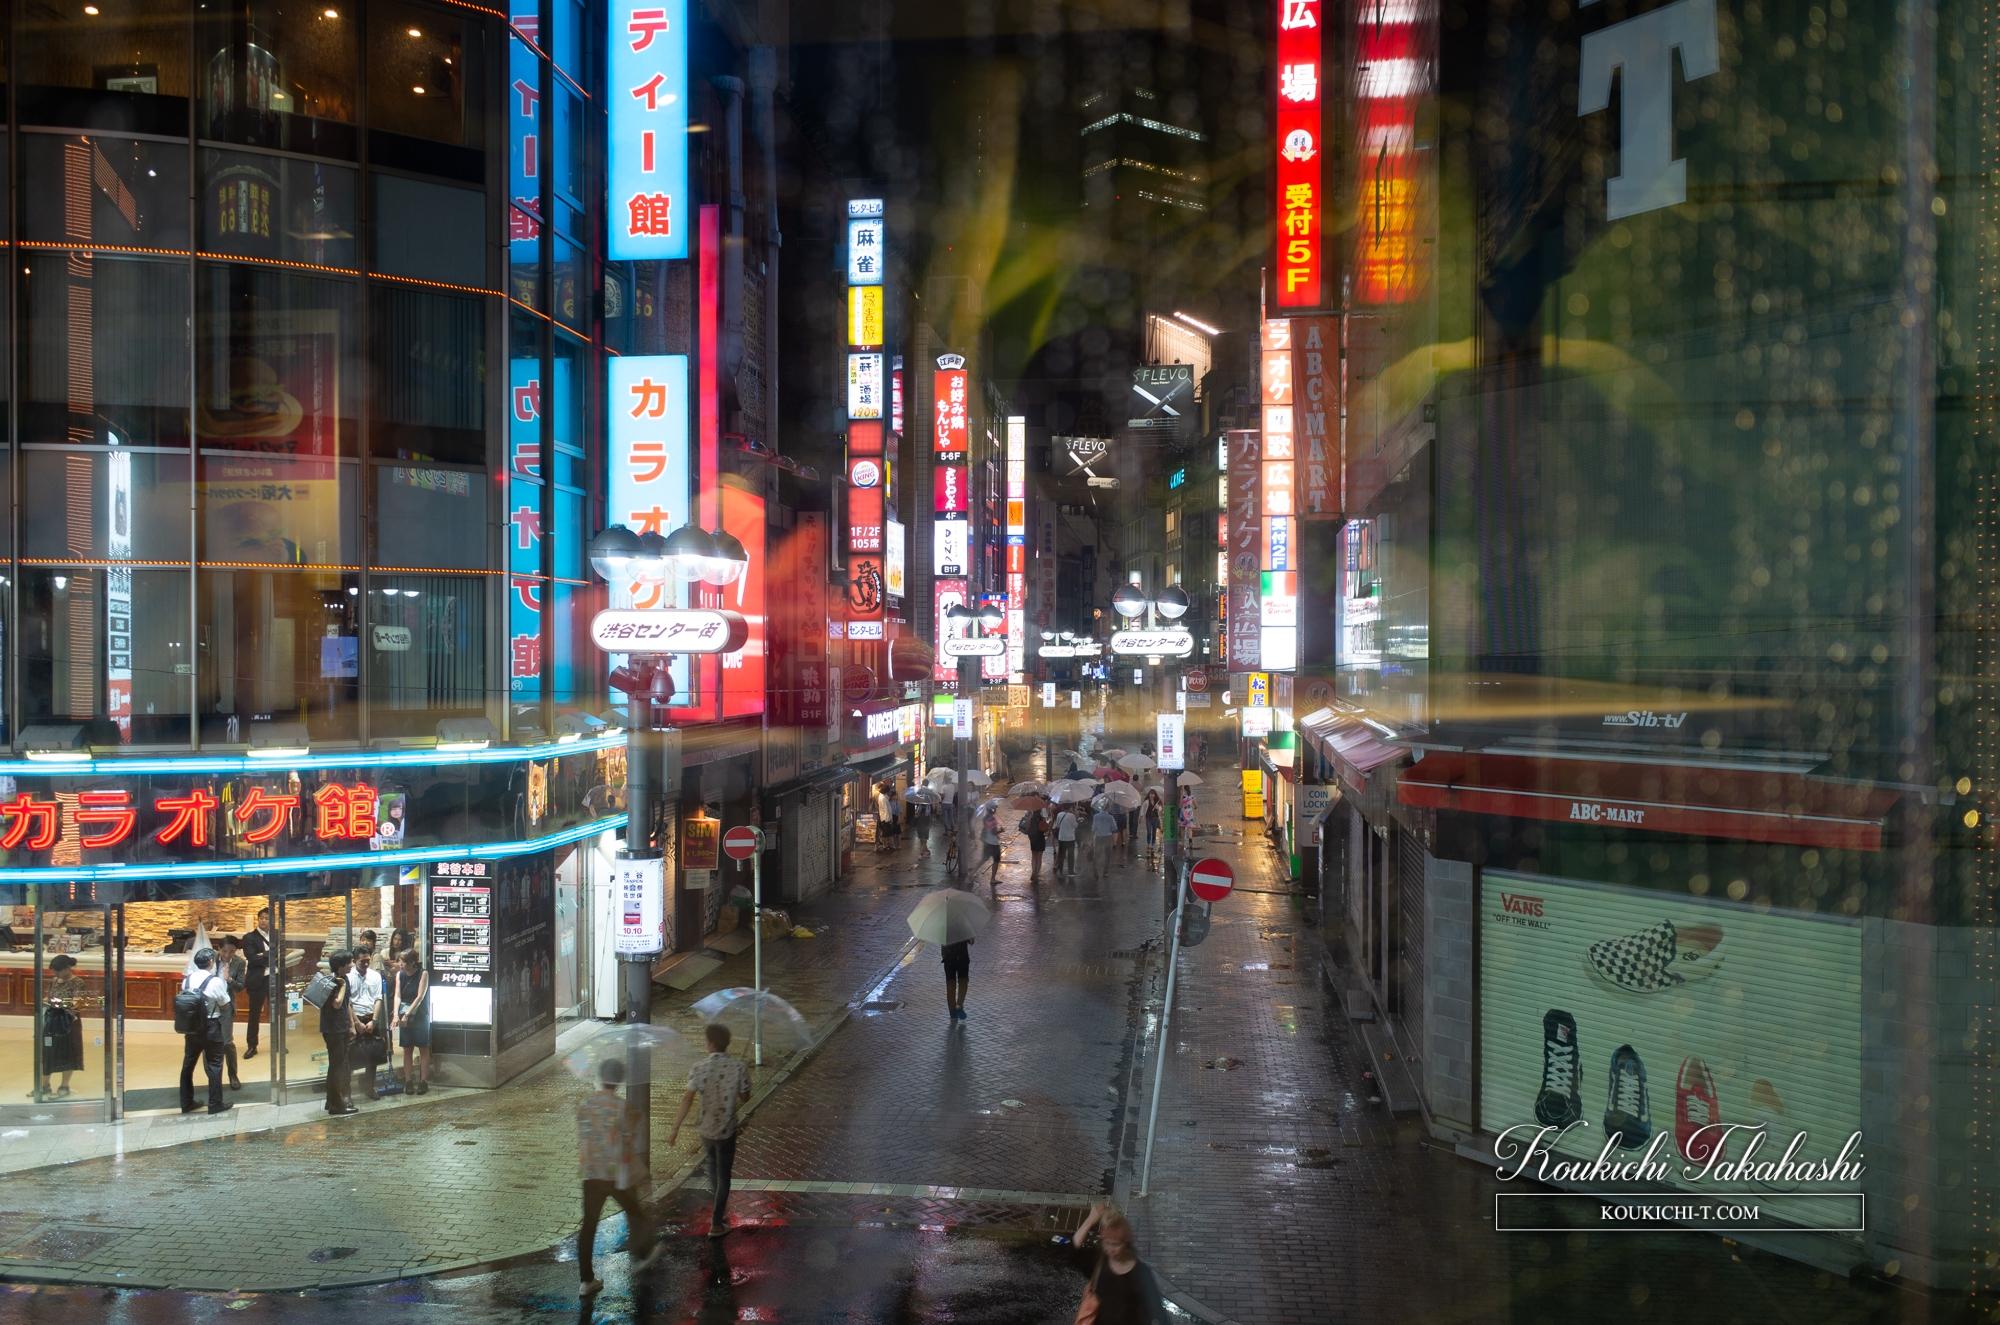 Adobe Lightroom 写真現像レタッチ講座サンプル Before After 雨の渋谷センター街 RAW